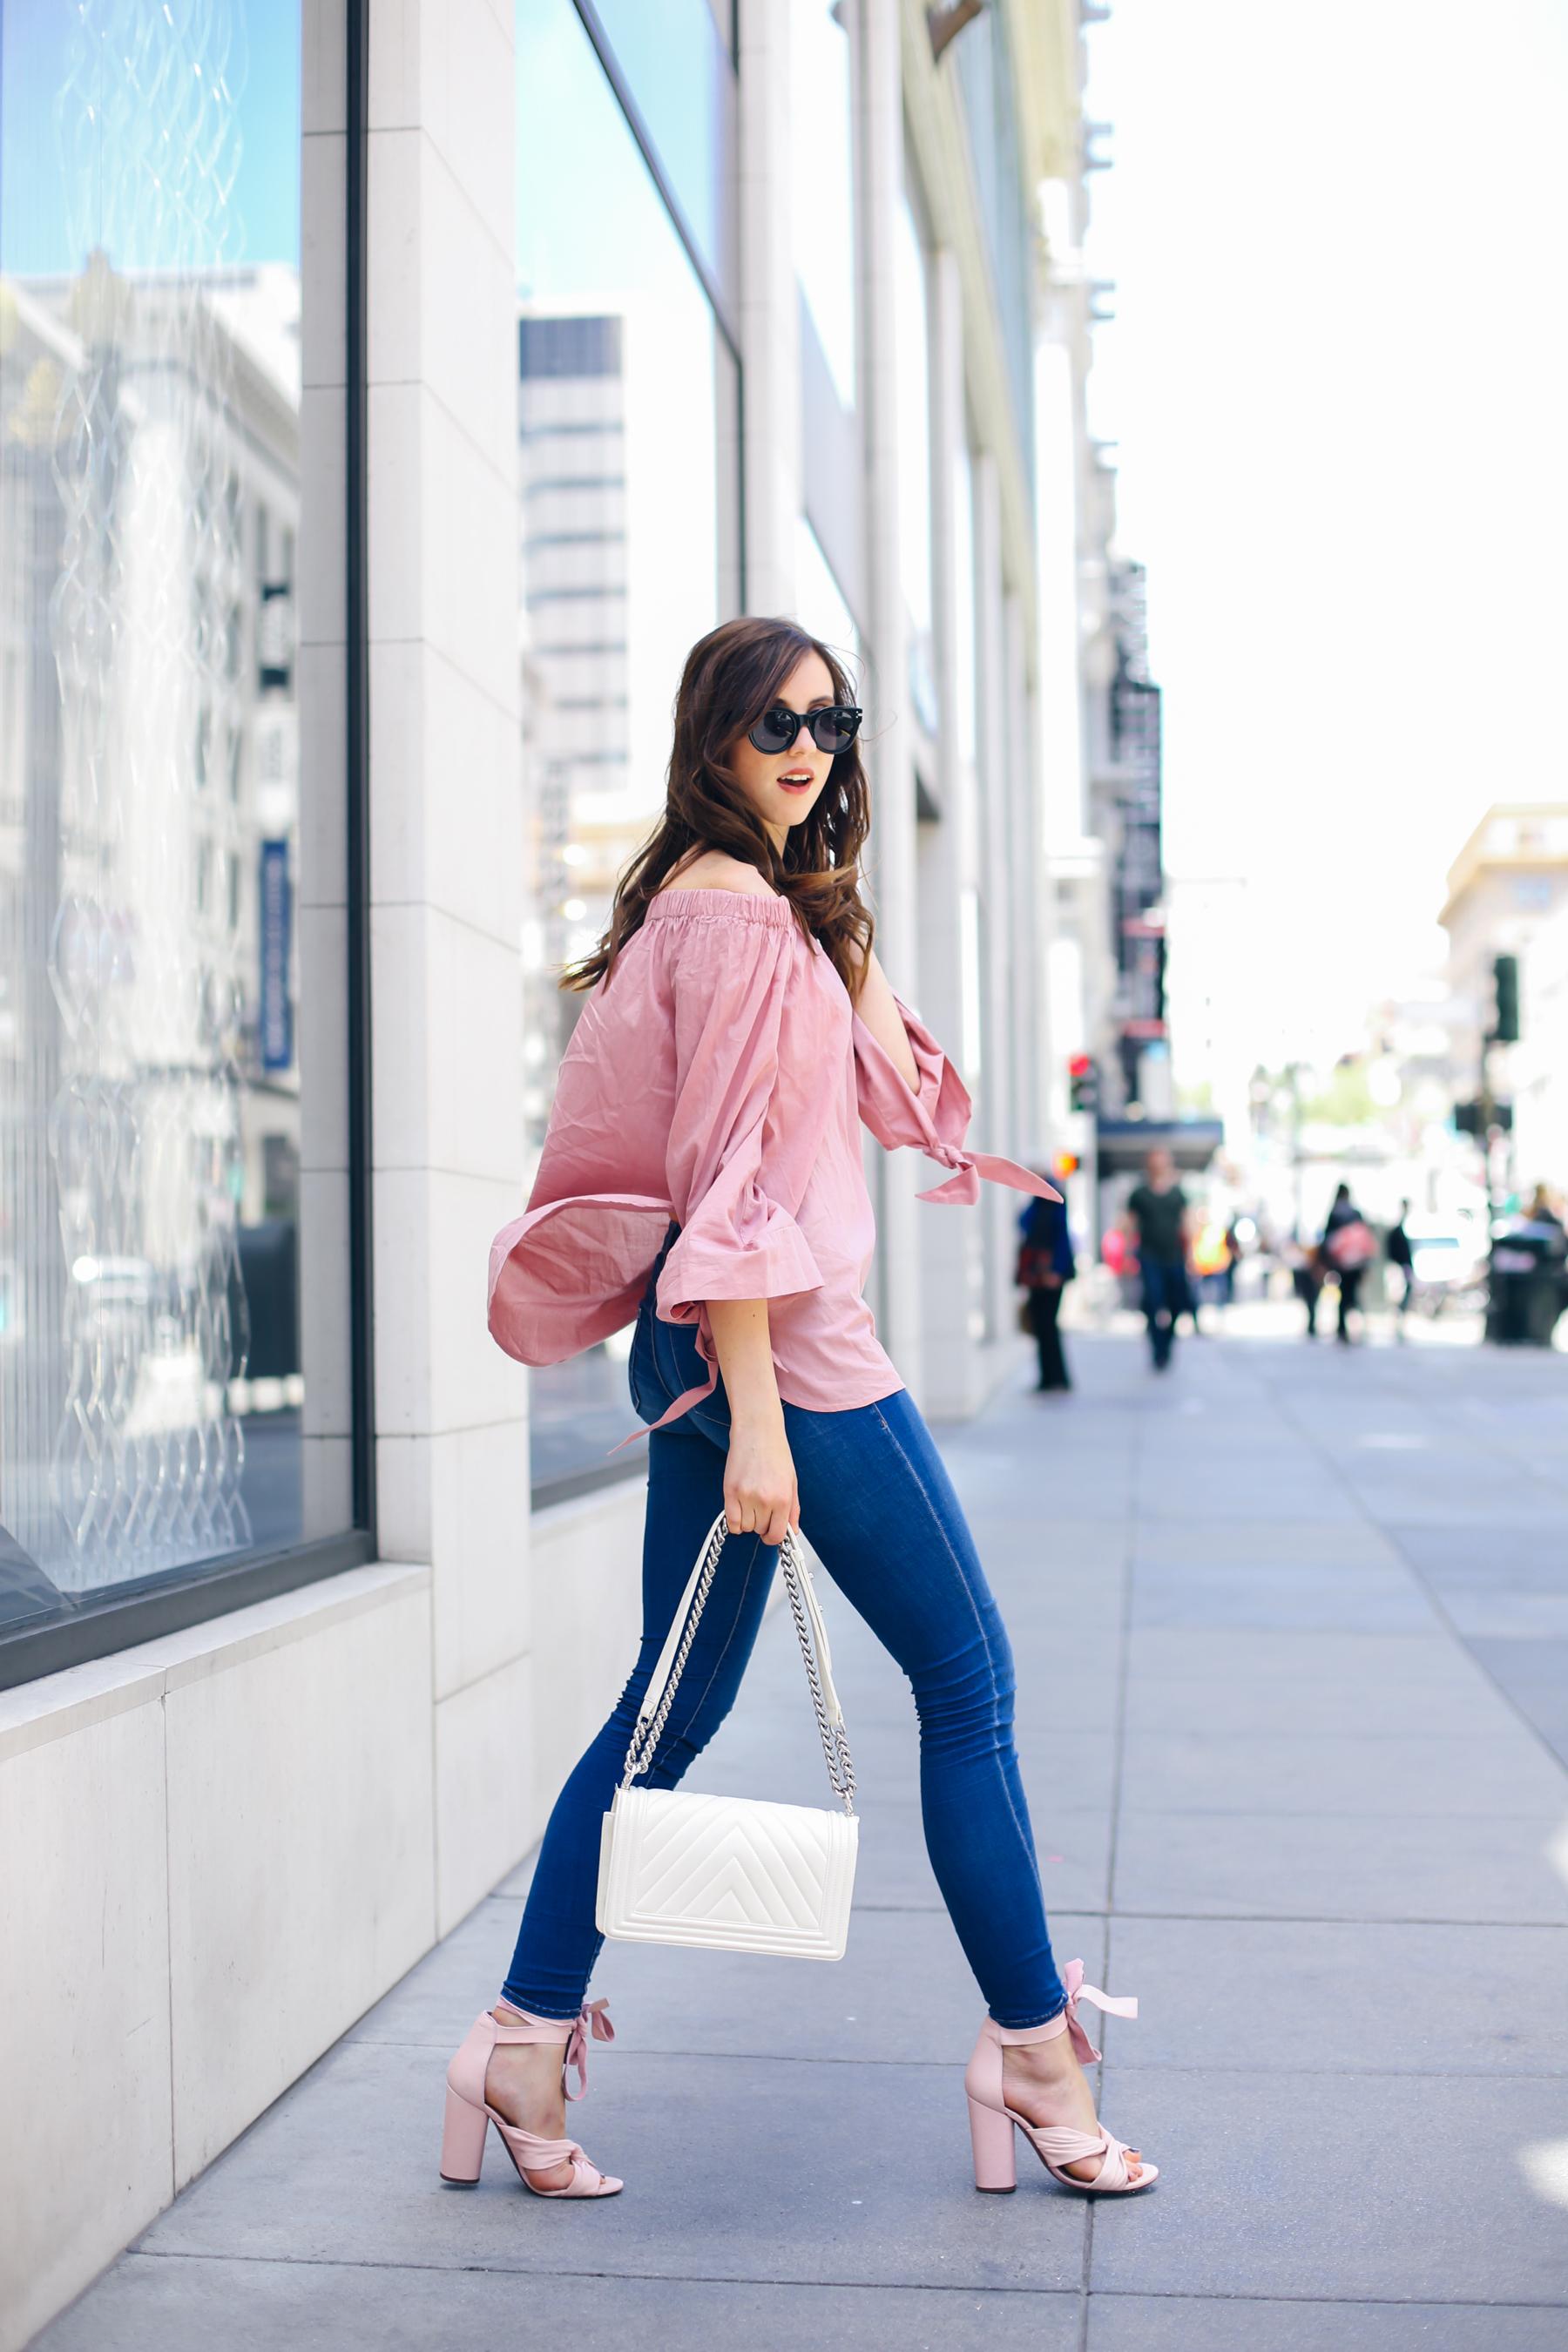 Barbora-Ondracova-FashioninmySoul-Fashion-Blogger-Photography-RyanbyRyanChua-7271